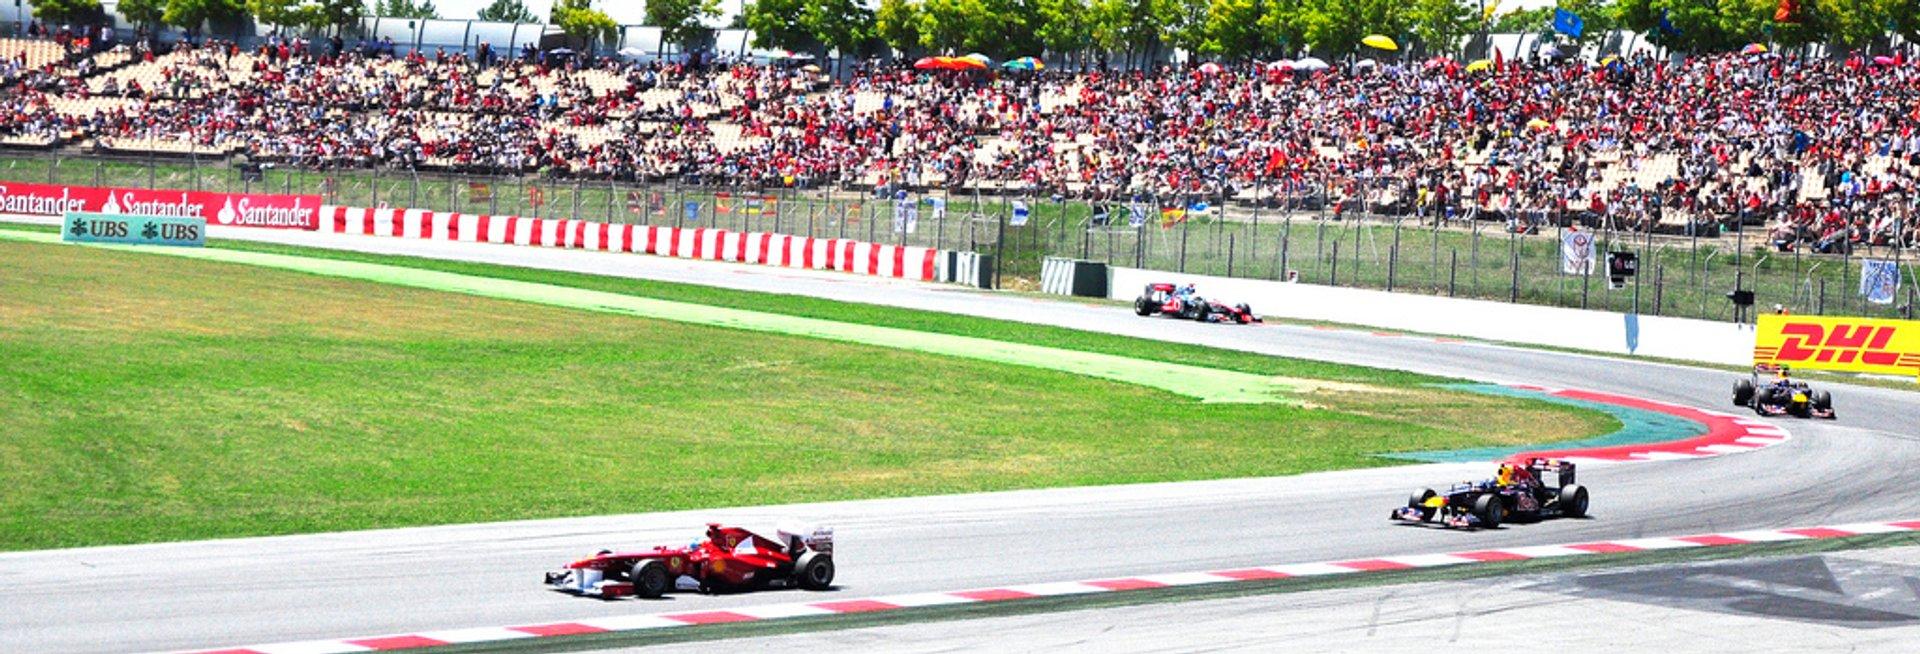 Formula 1 Gran Premio De España in Barcelona - Best Season 2020